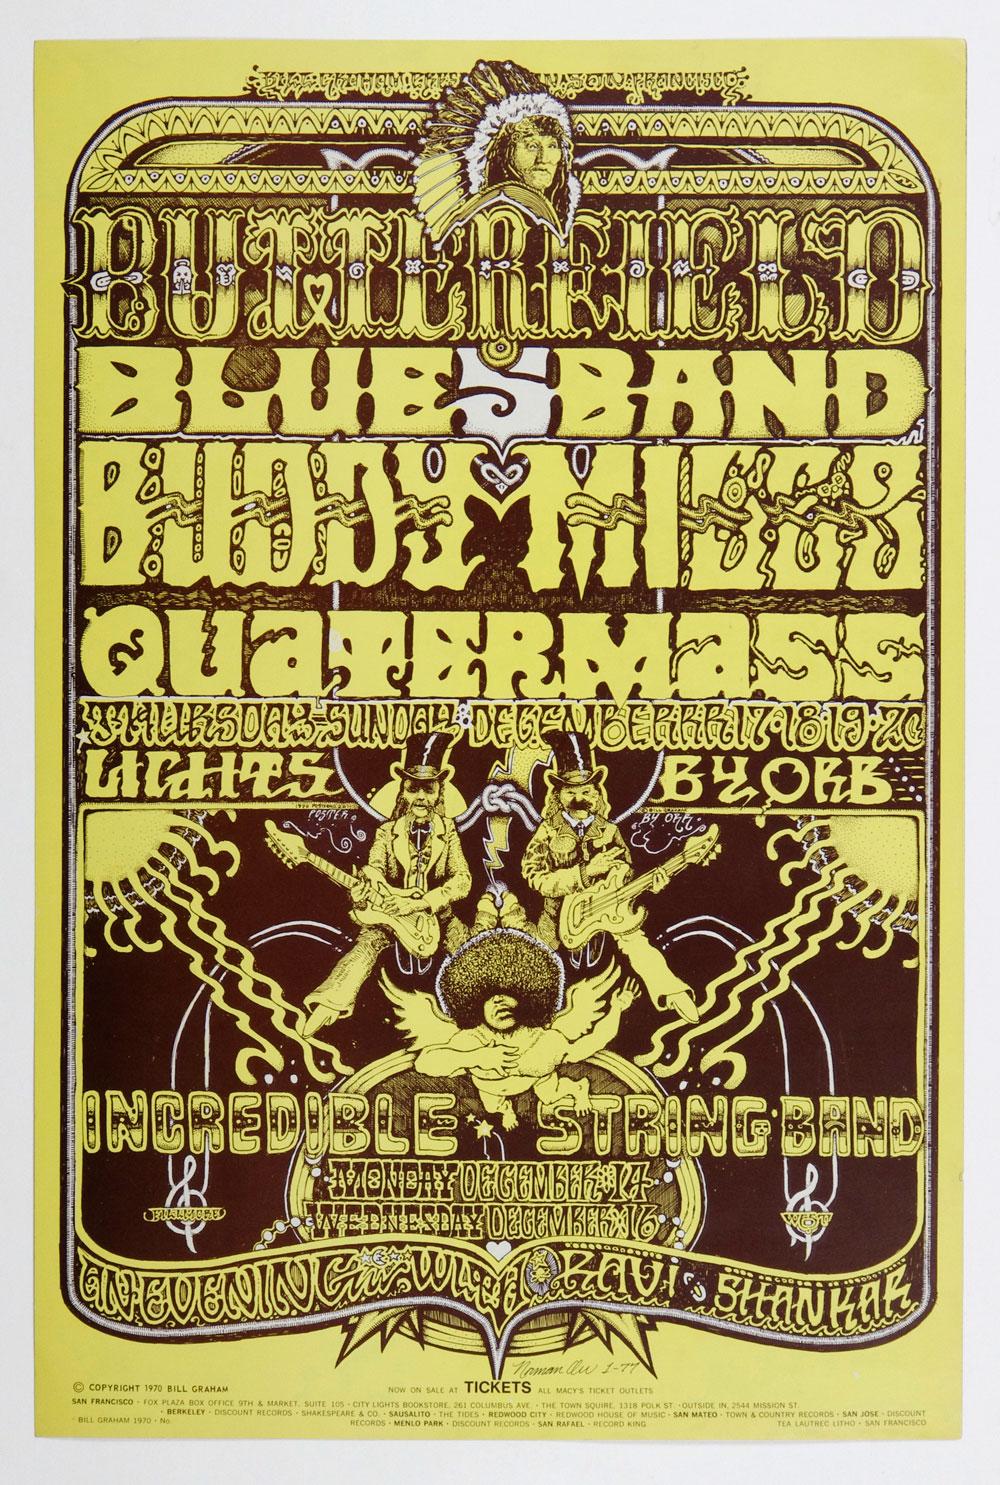 Bill Graham 261 Poster Incredible String Band Ravi Shankar 1970 Dec 14 Norman Orr signed